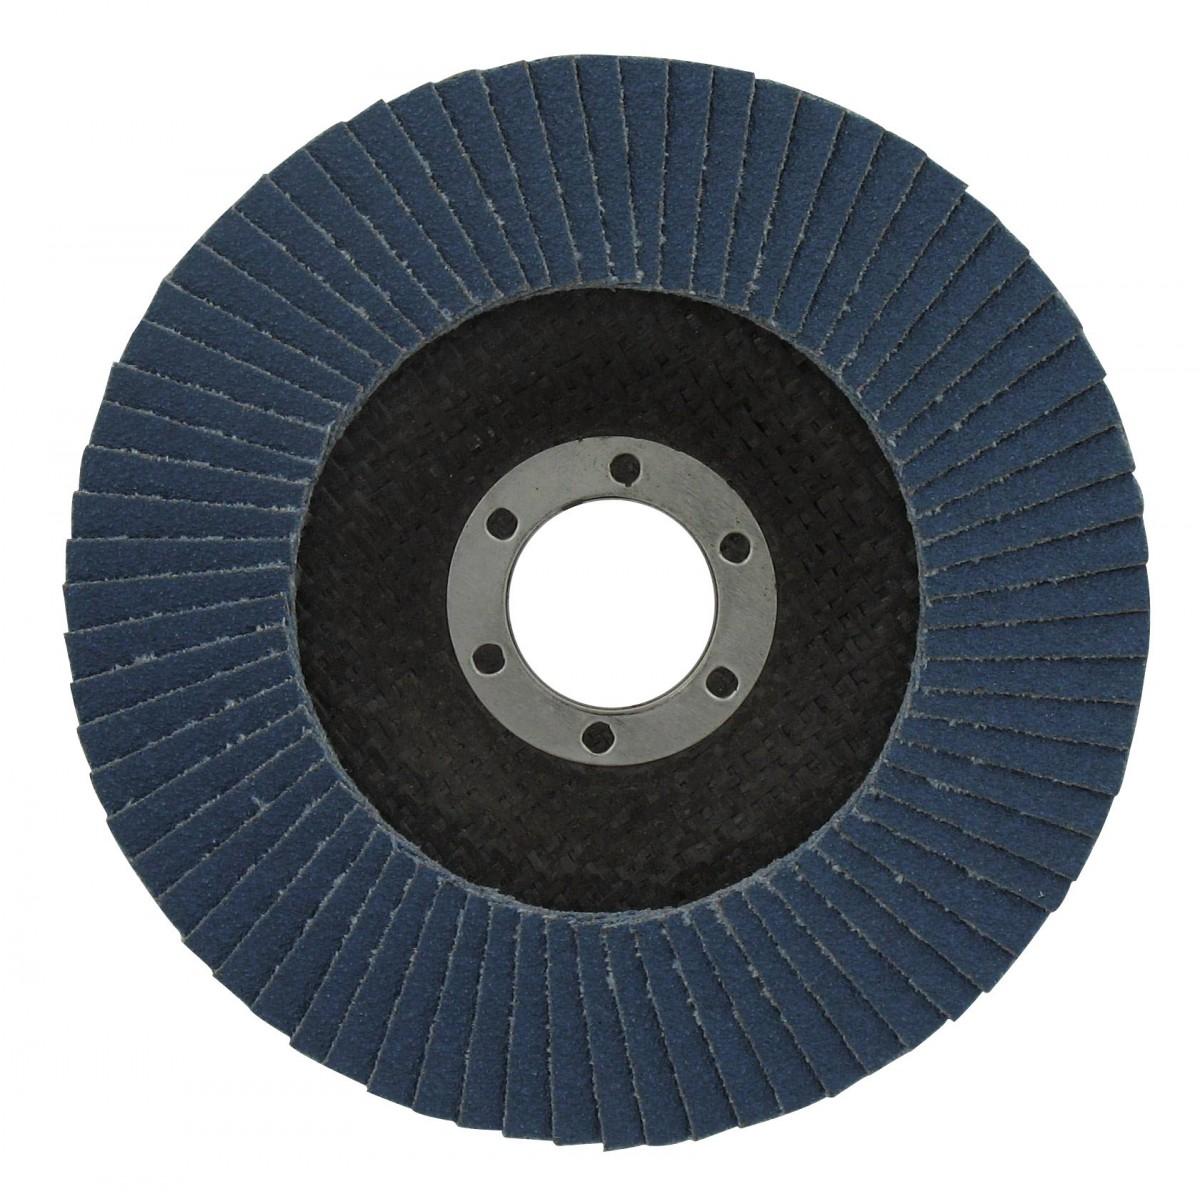 Disque zirconium standard diamètre 125 mm SCID - Grain 40 - Vendu par 1